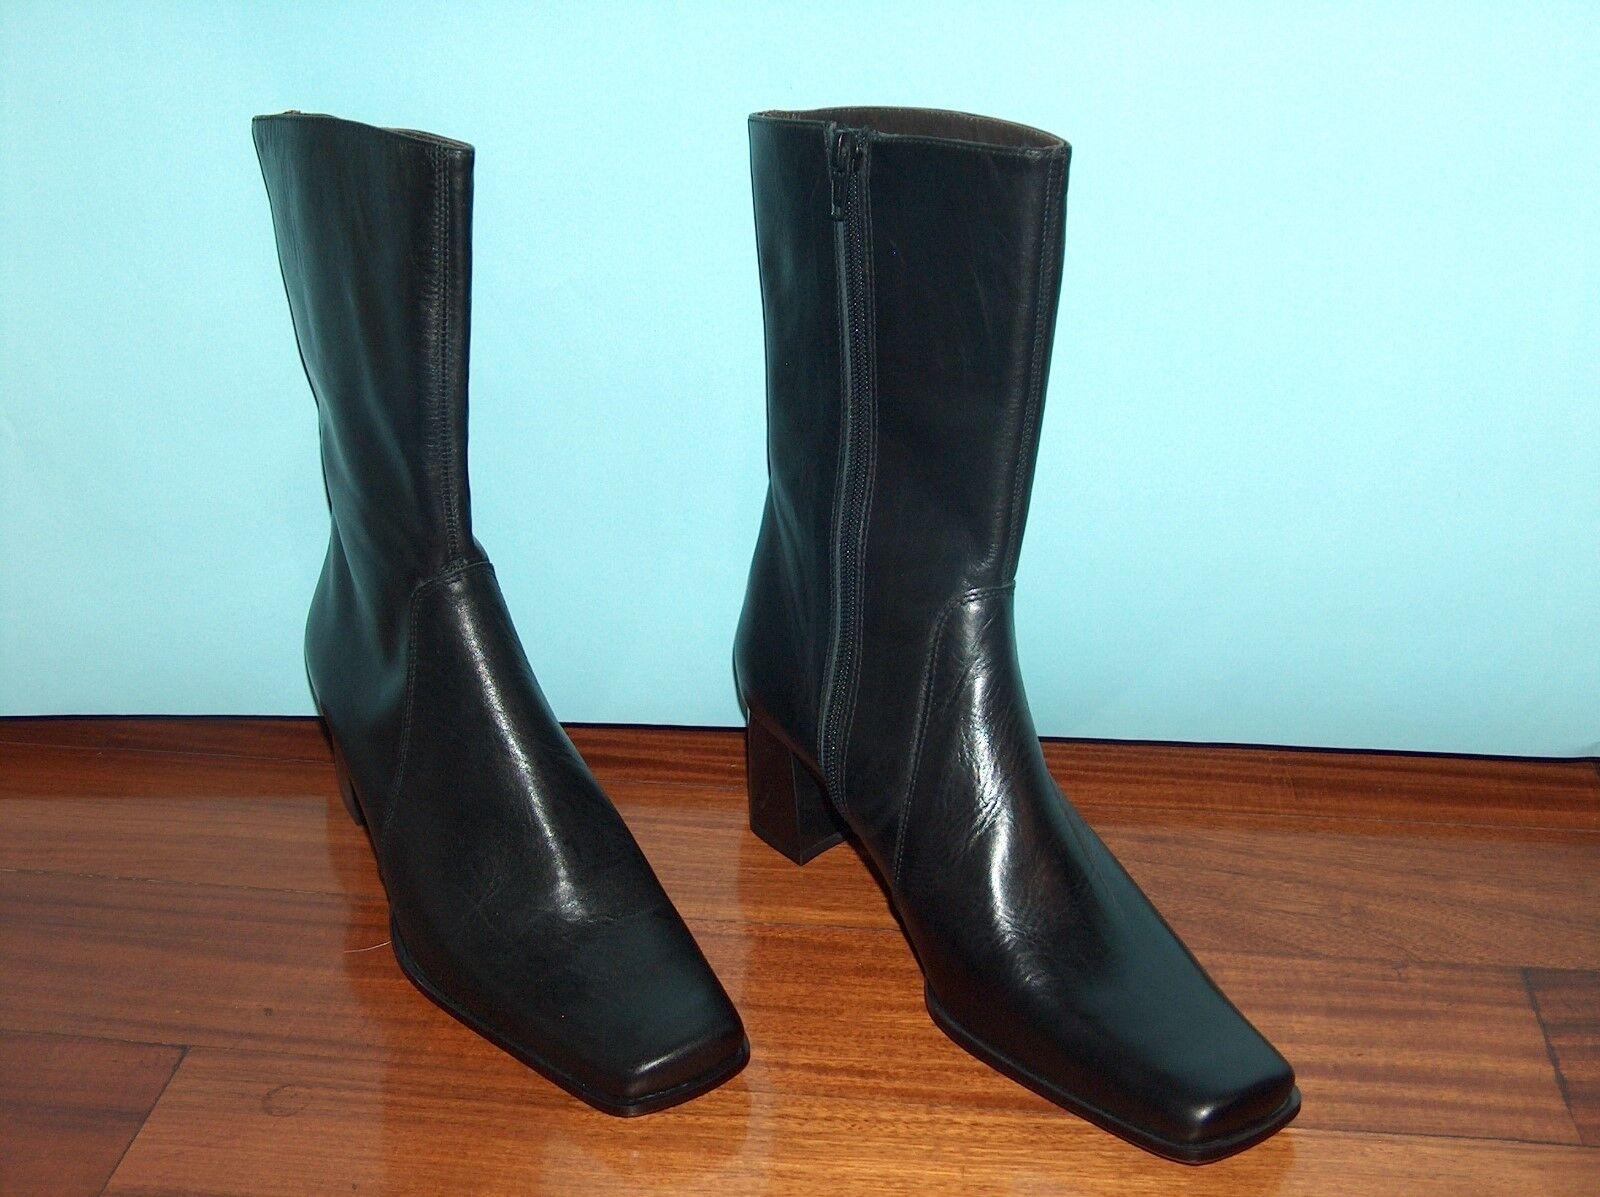 SALE Women Boots Freeback N 37 Genuine Leather